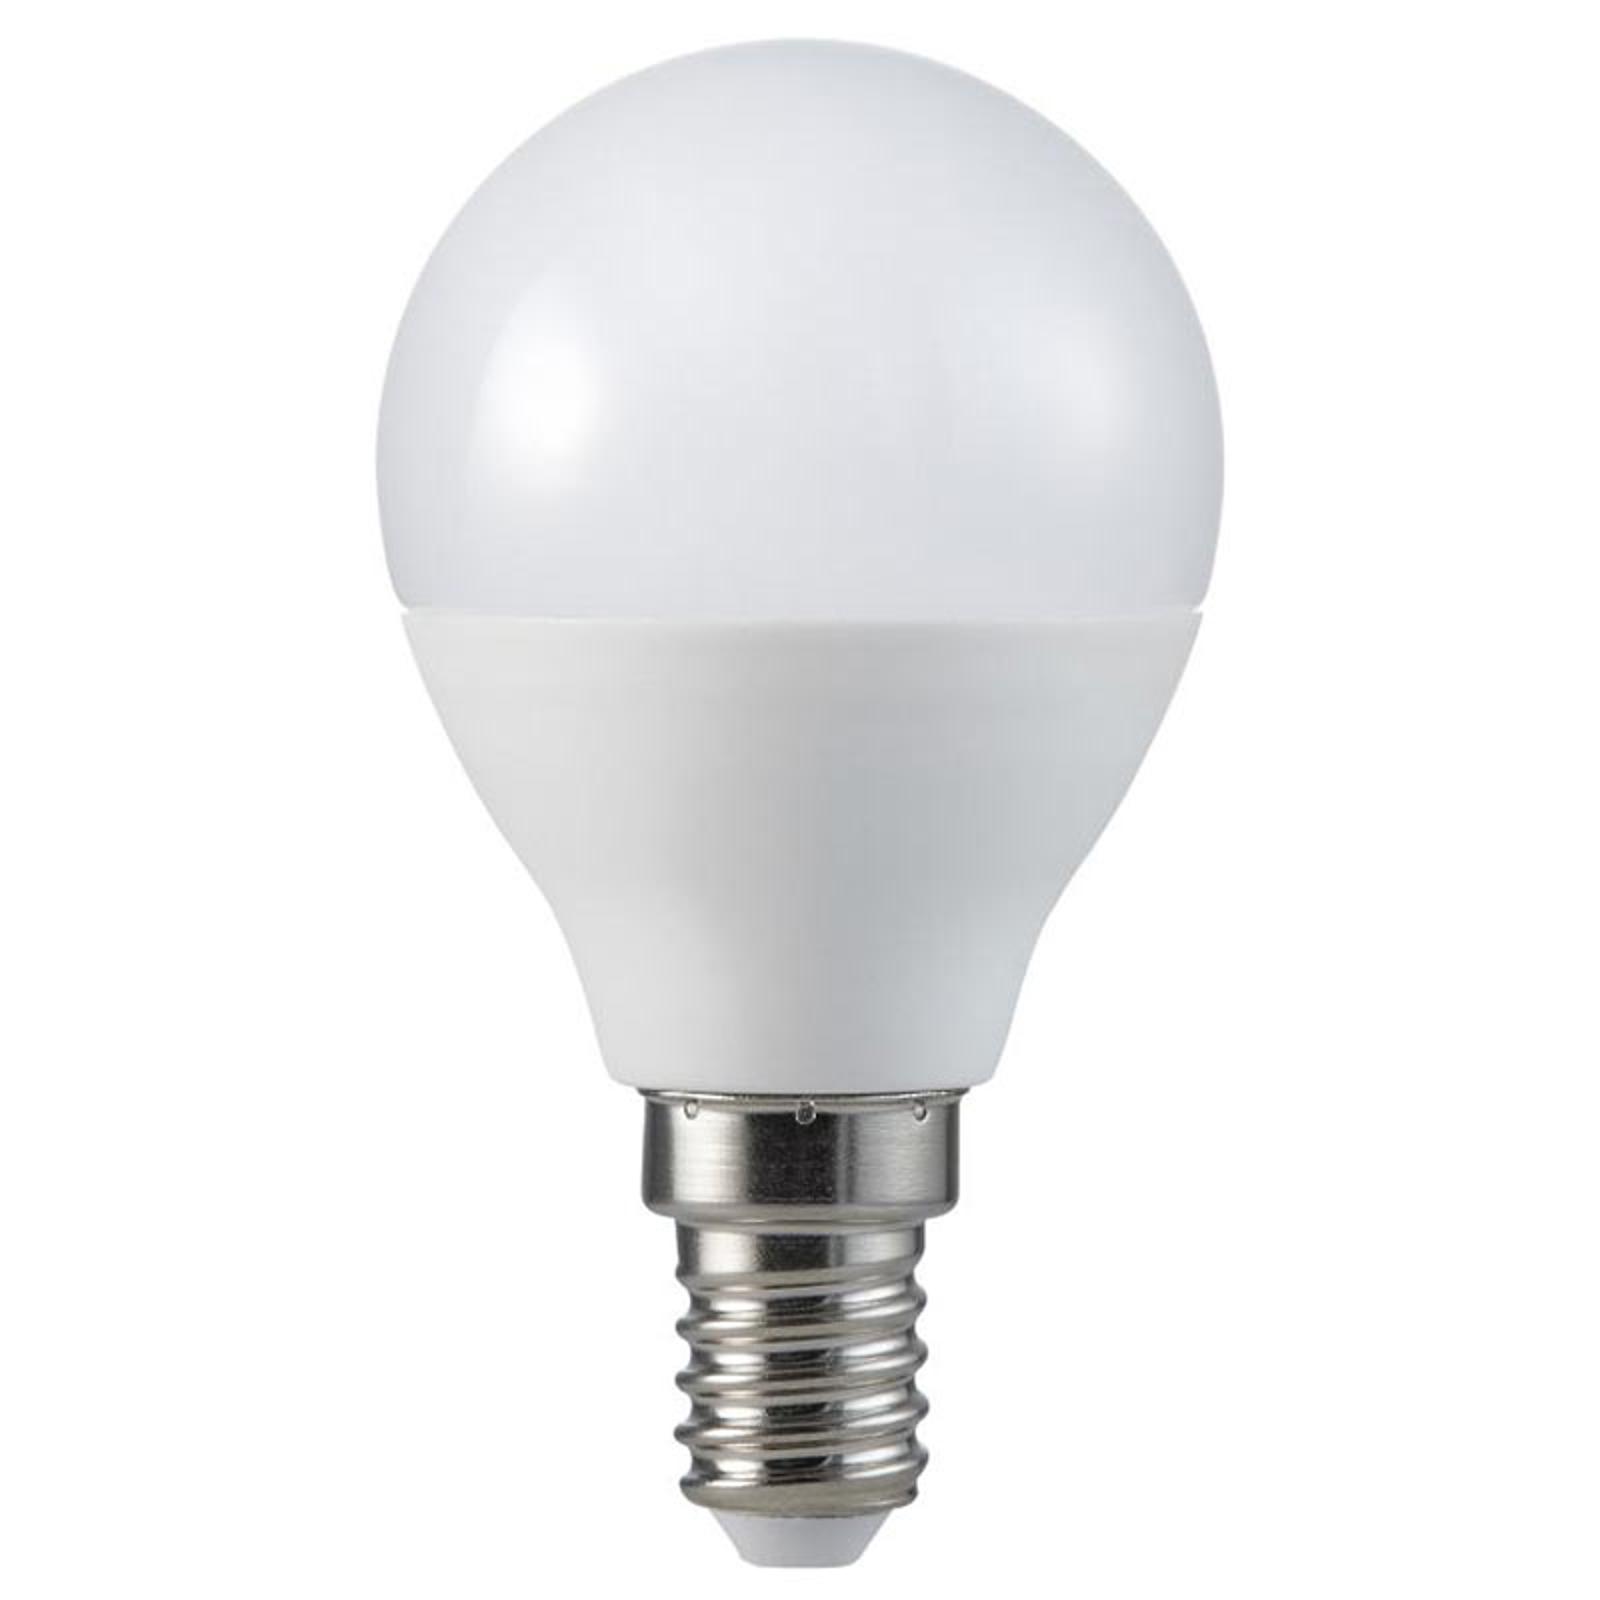 LED-dropplampa E14 5,5 W 2 700 K 420 lumen Ra95